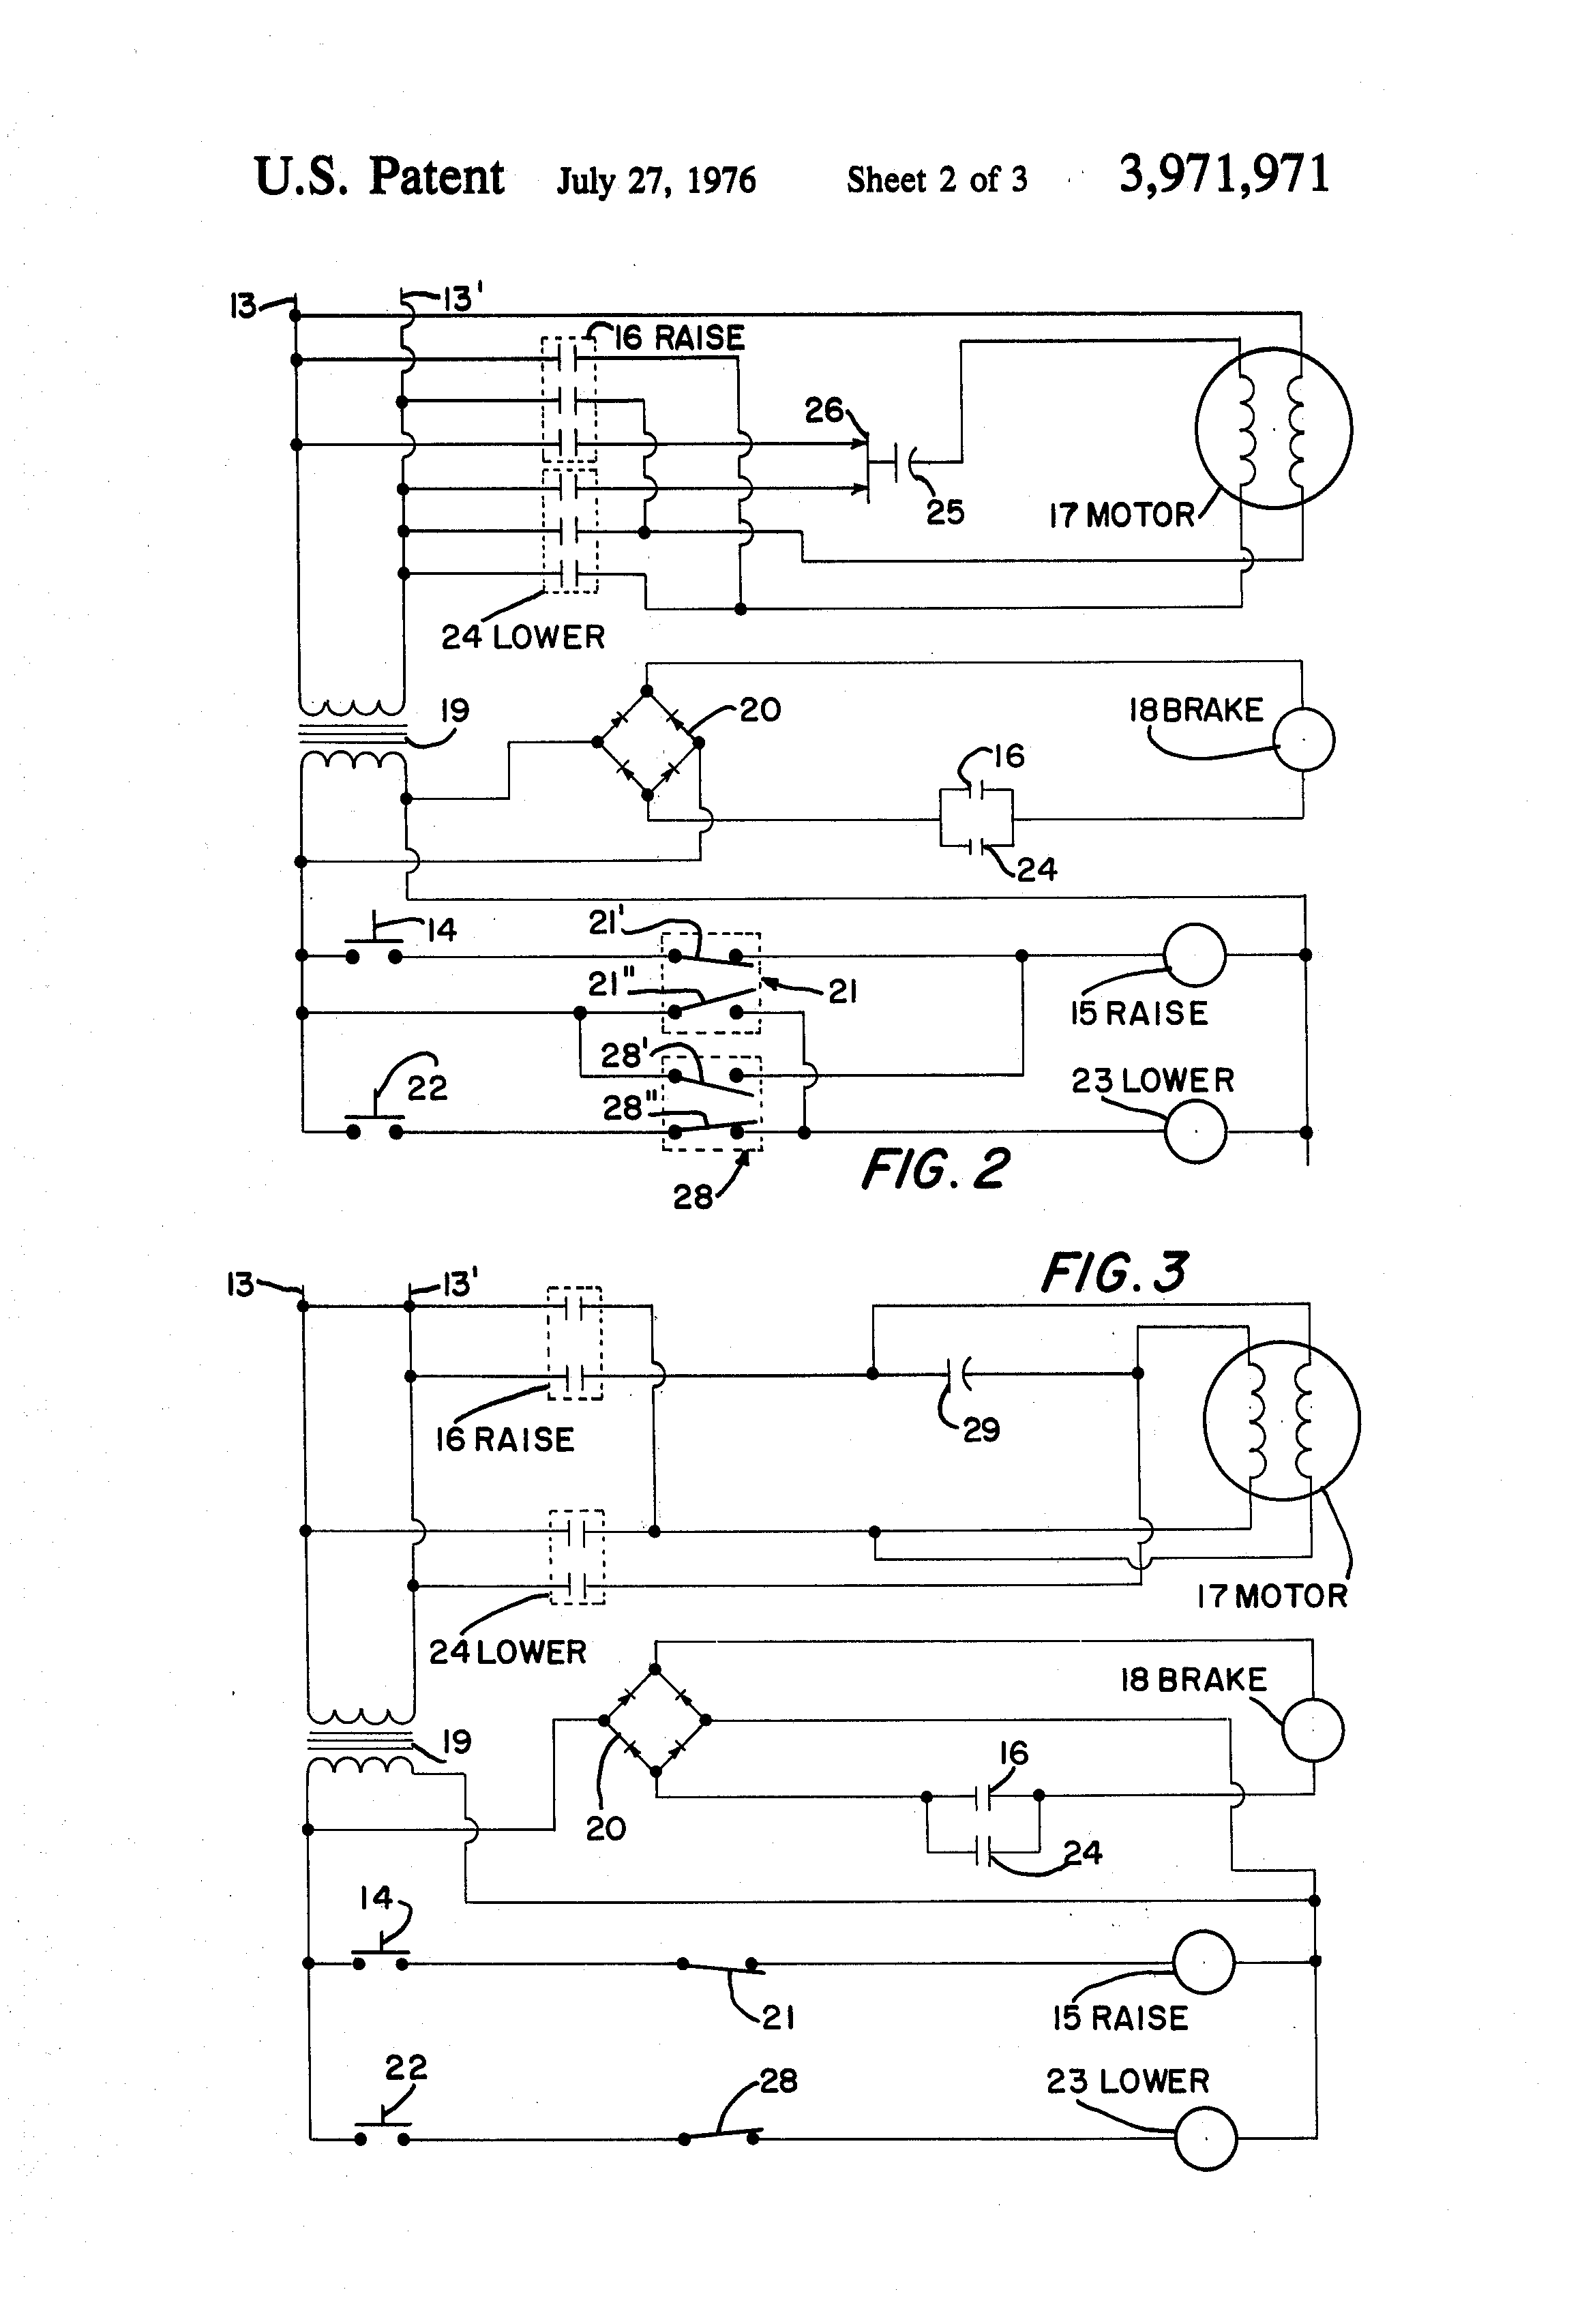 Kz 3176  Strong Way Electric Hoist Wiring Diagram Wiring